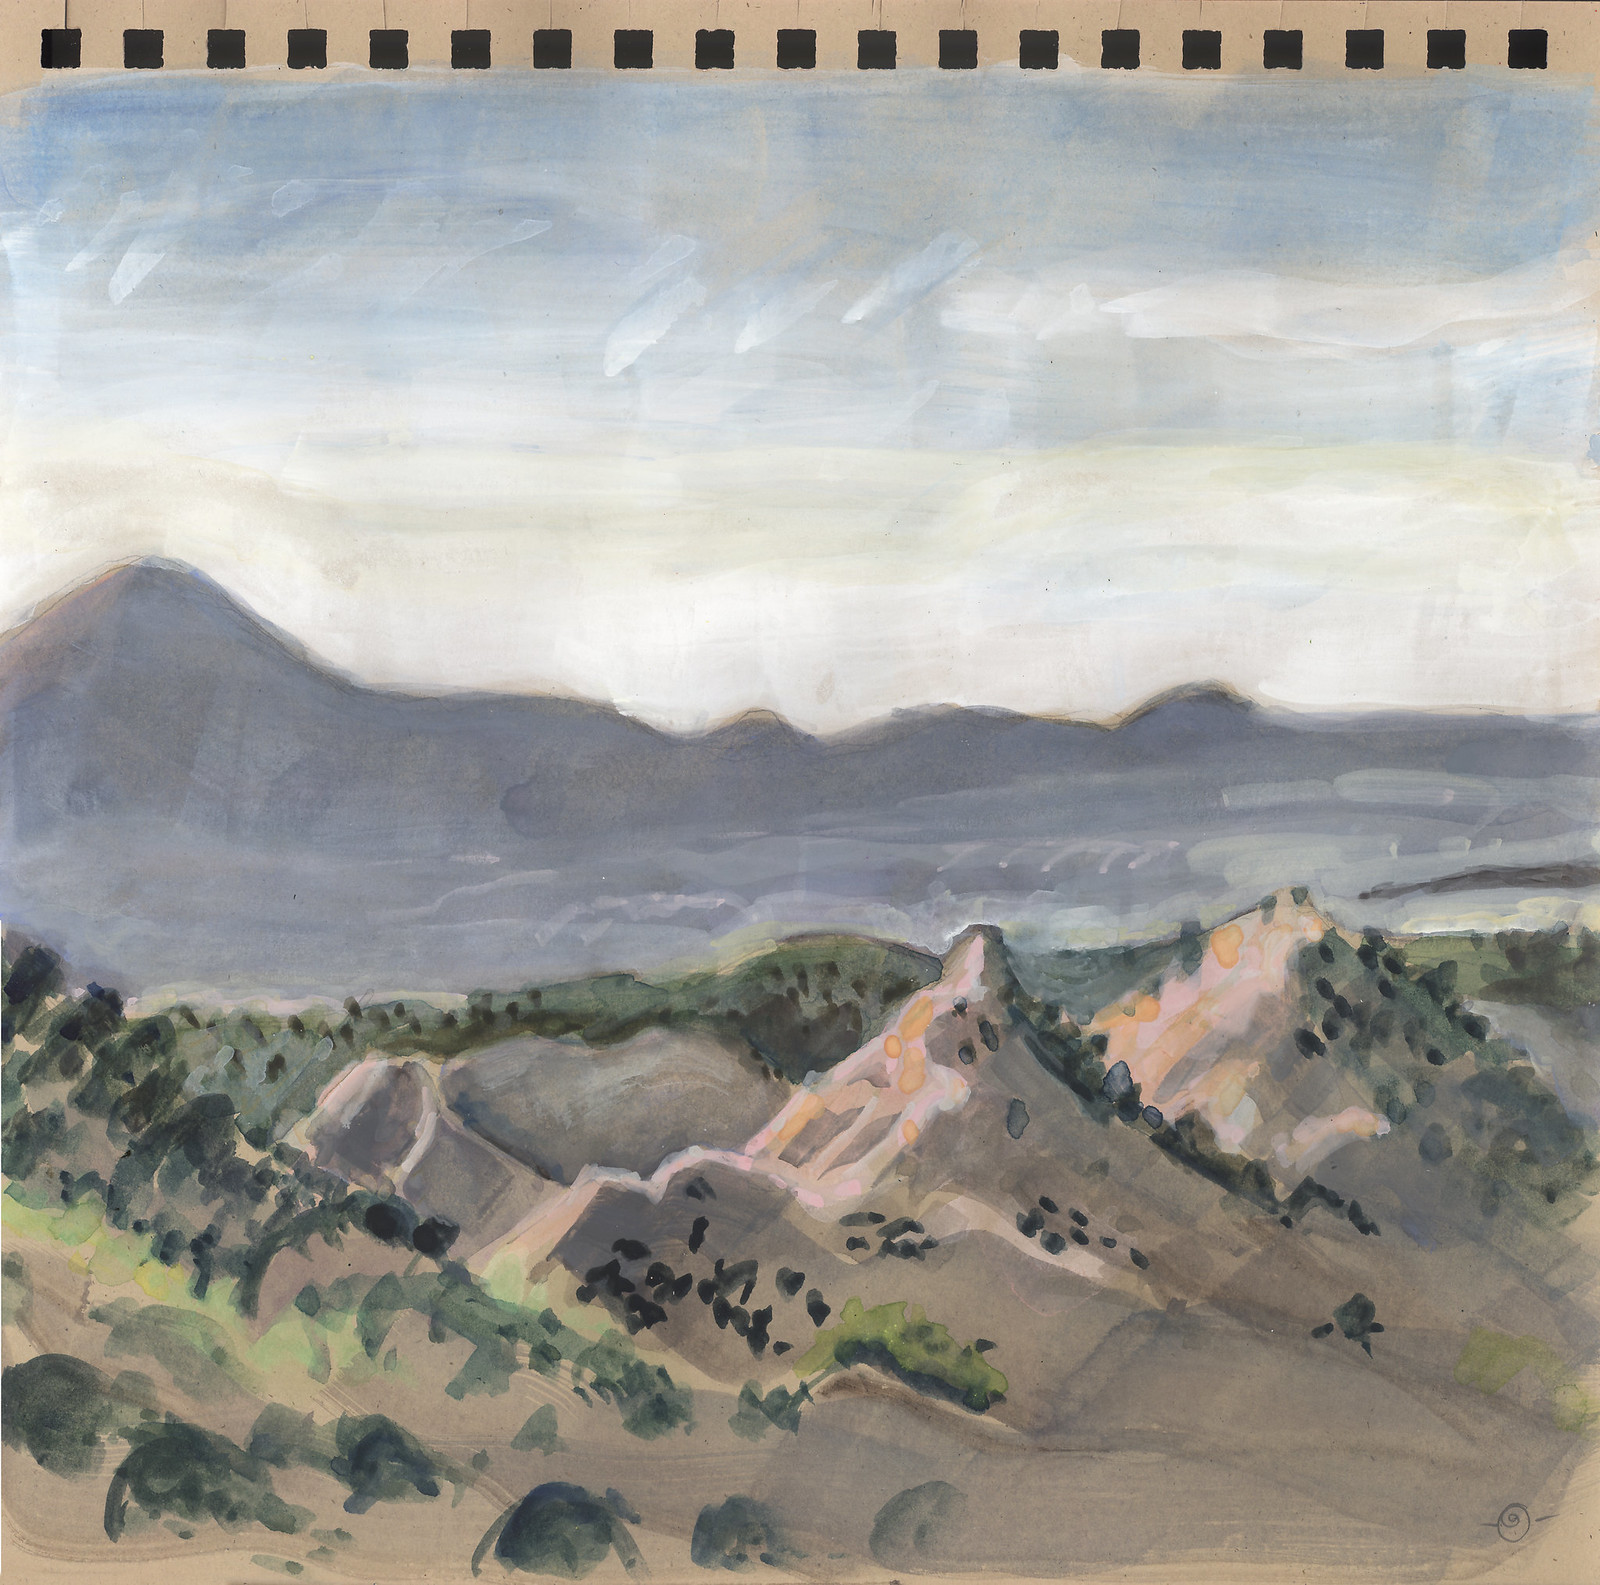 Foothills of Sangre de Cristo Mountains, Jemez Mountains beyond.